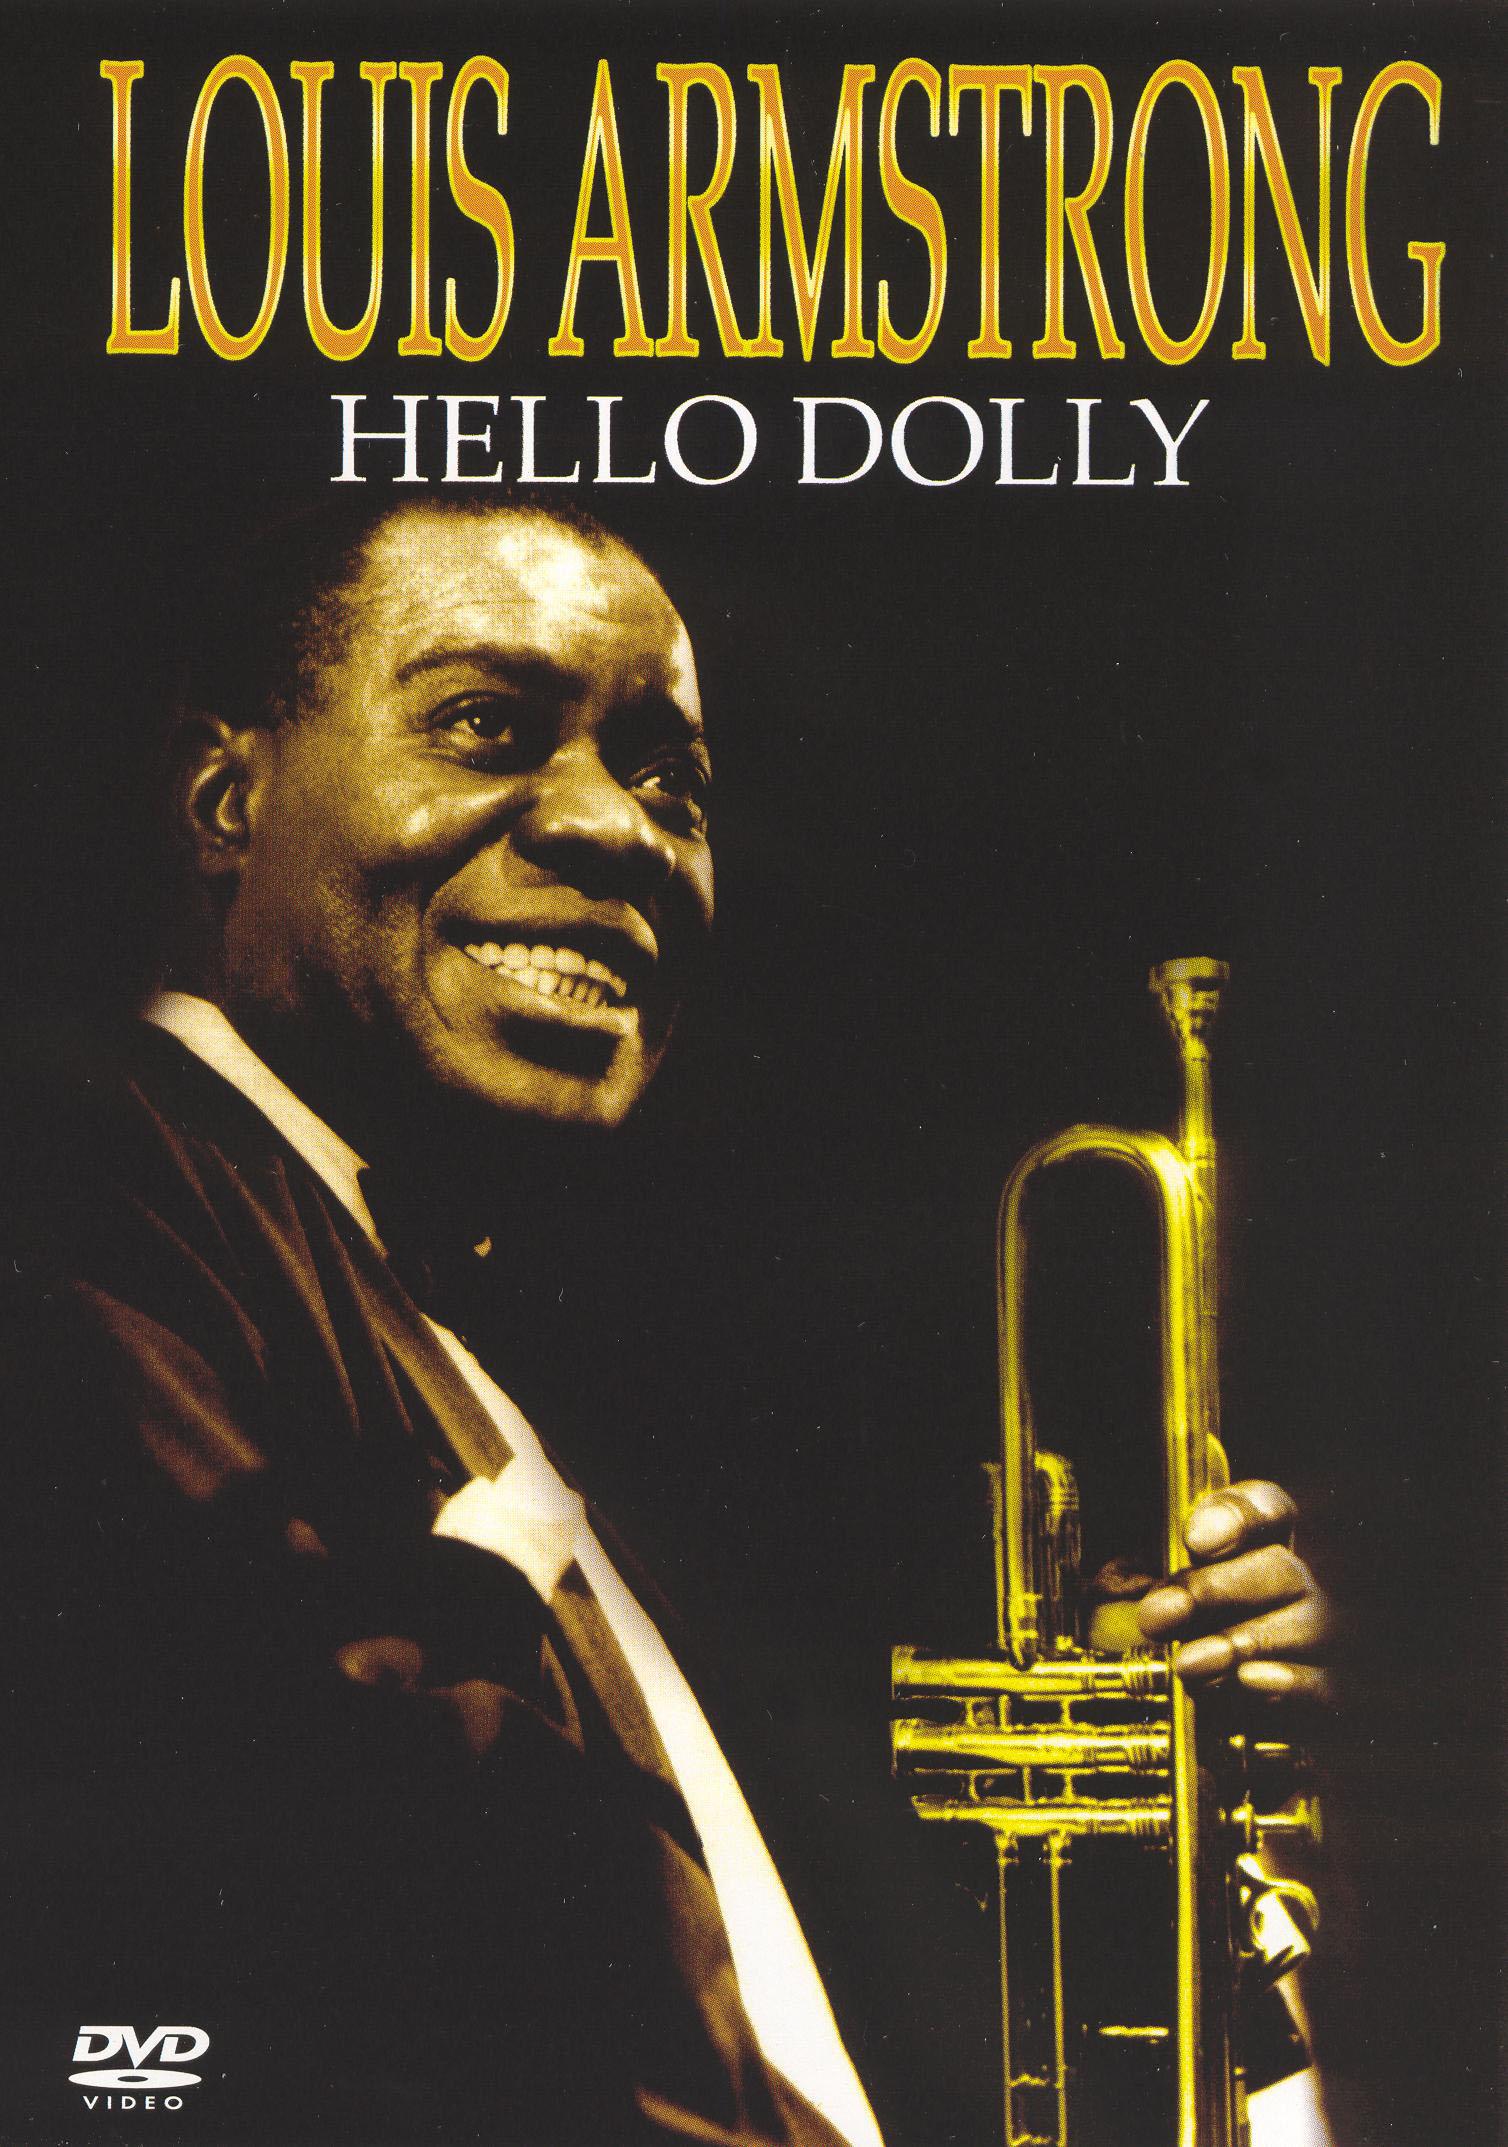 Louis Armstrong: Hello Dolly